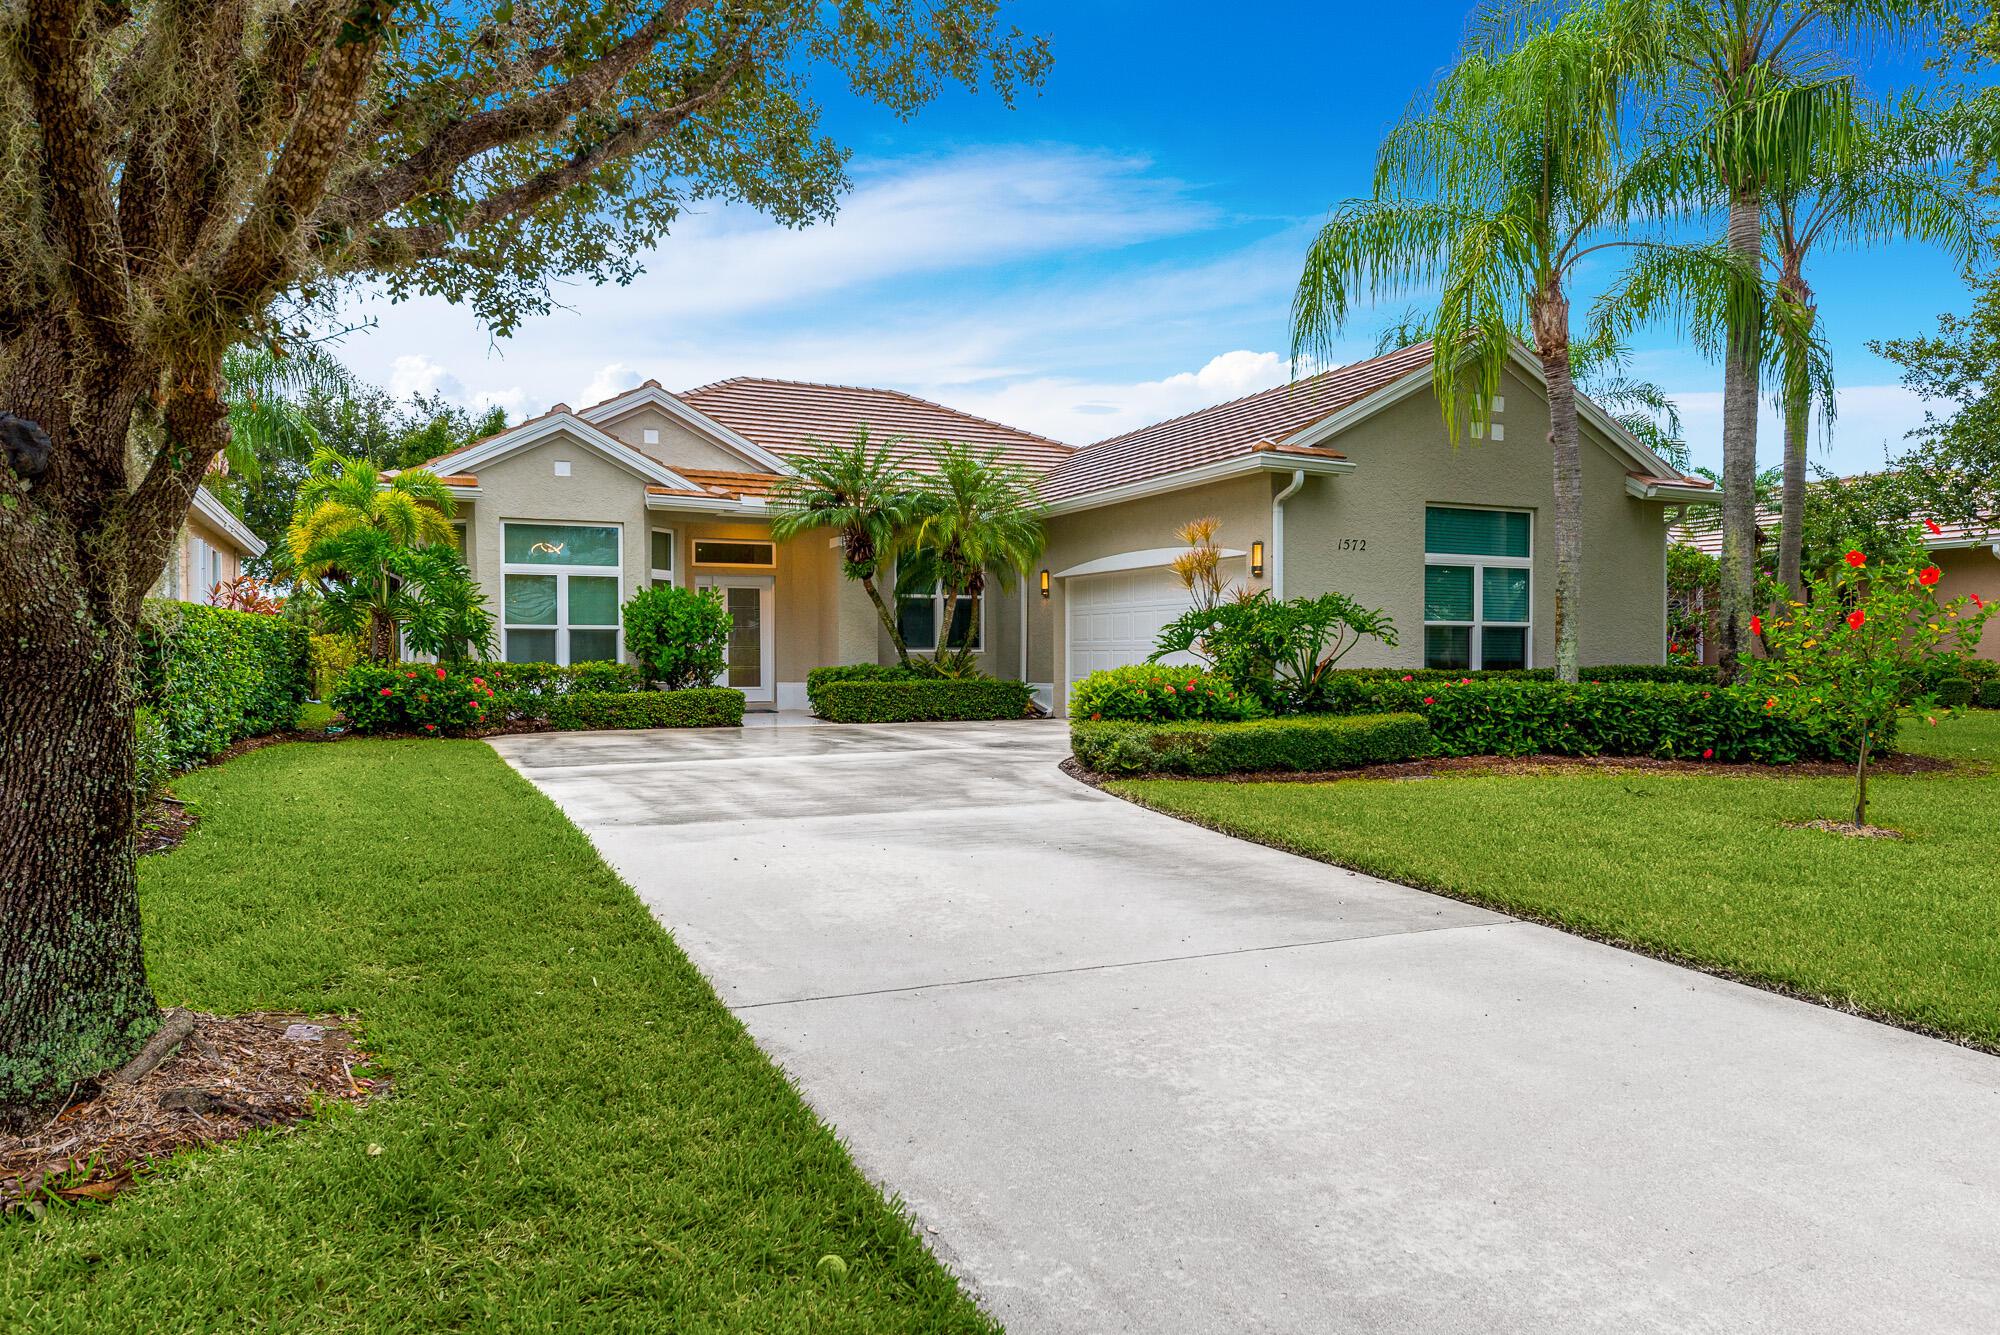 1572 Monarch Club, Palm City, Florida 34990